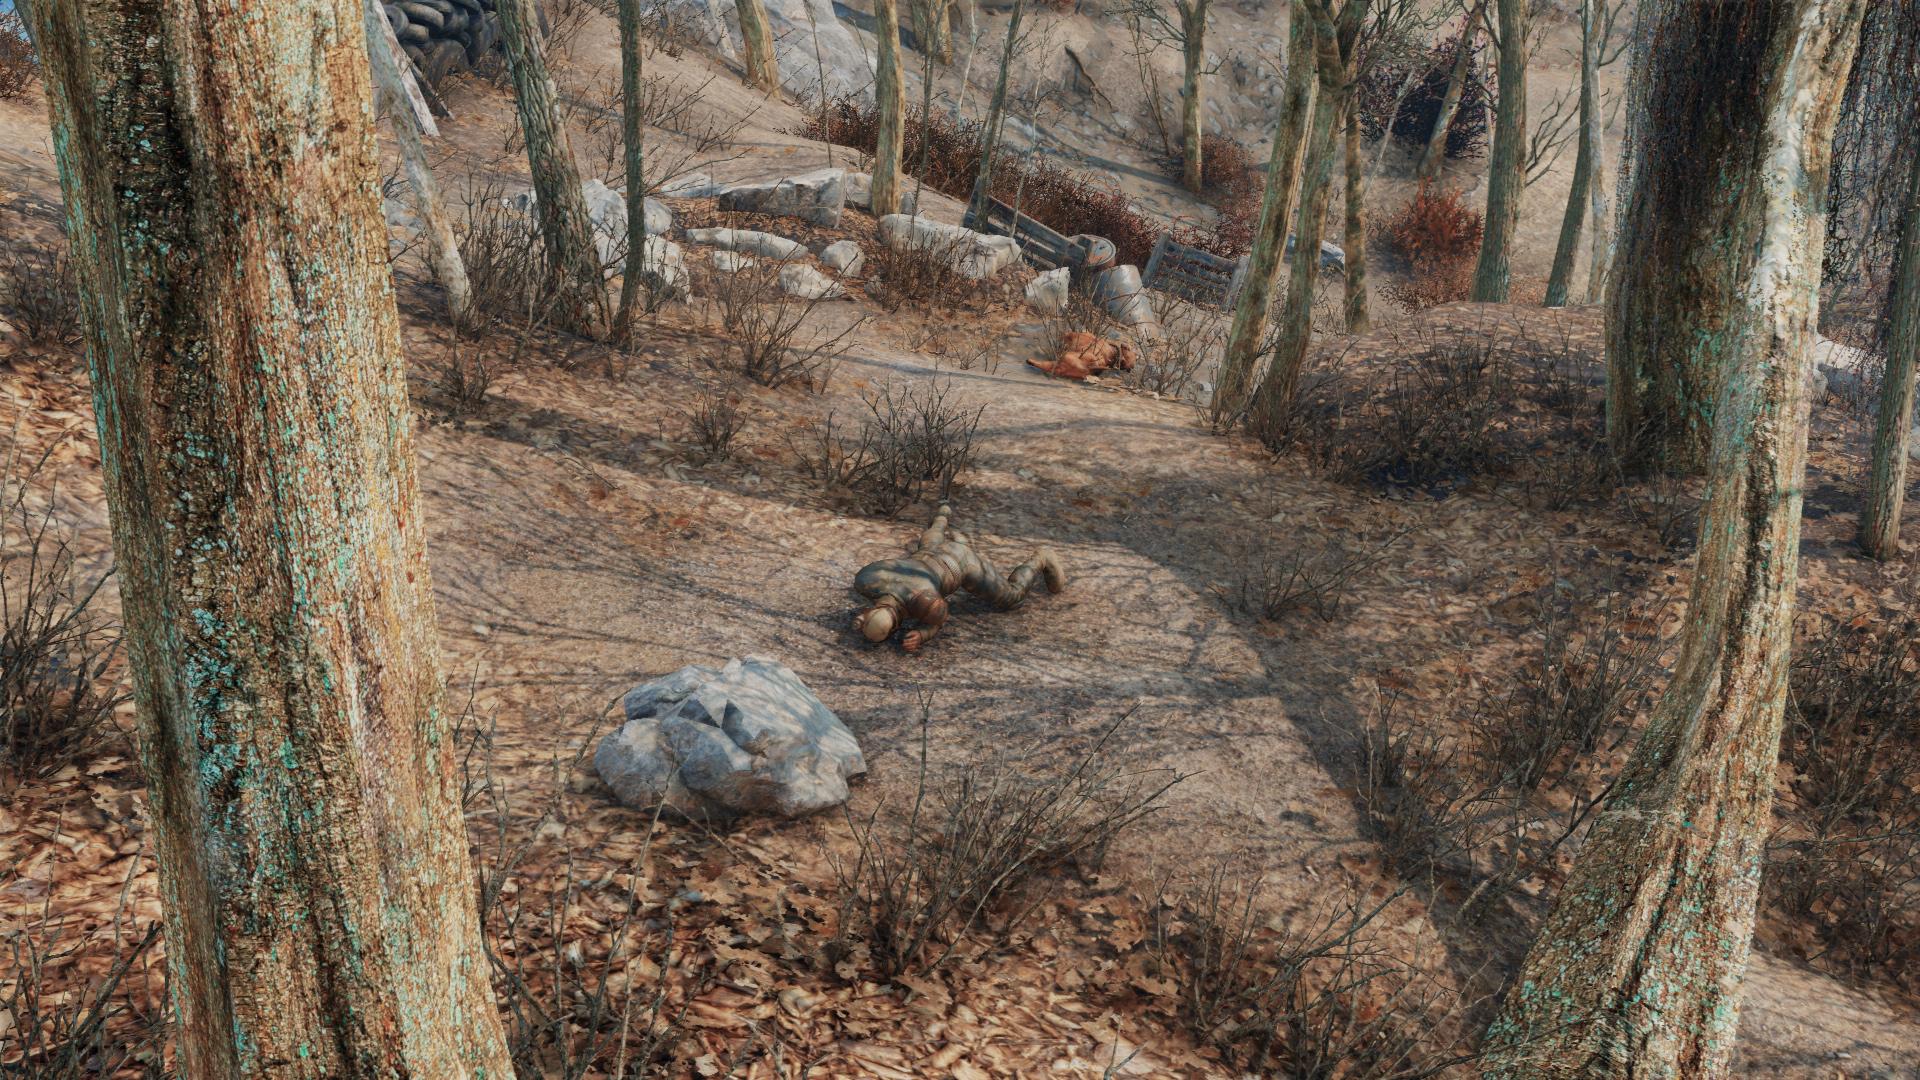 Fallout 4 получила новый набор 4K-текстур ландшафта